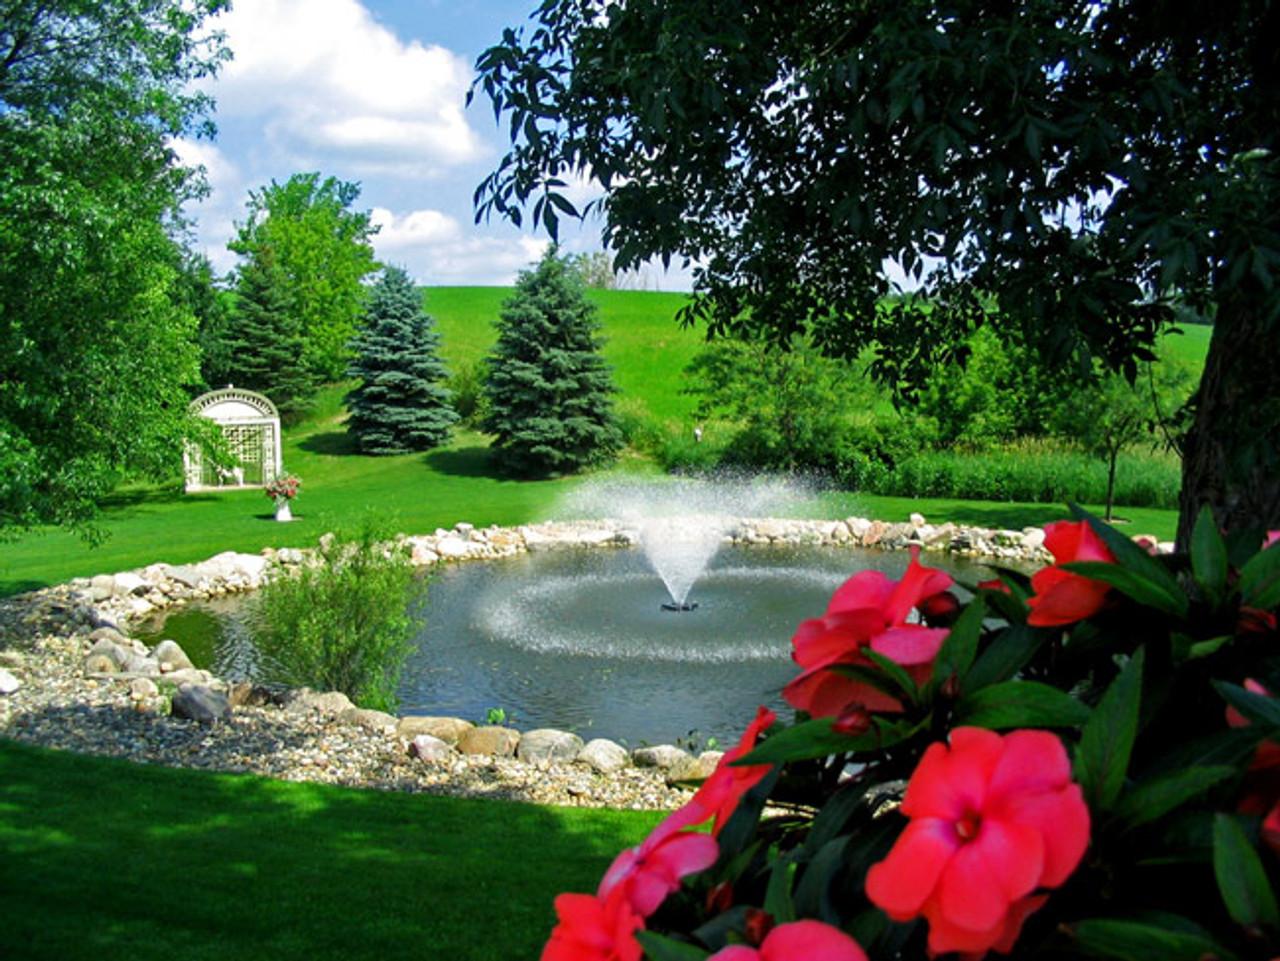 Kasco Fountain 4400VFX Backyard